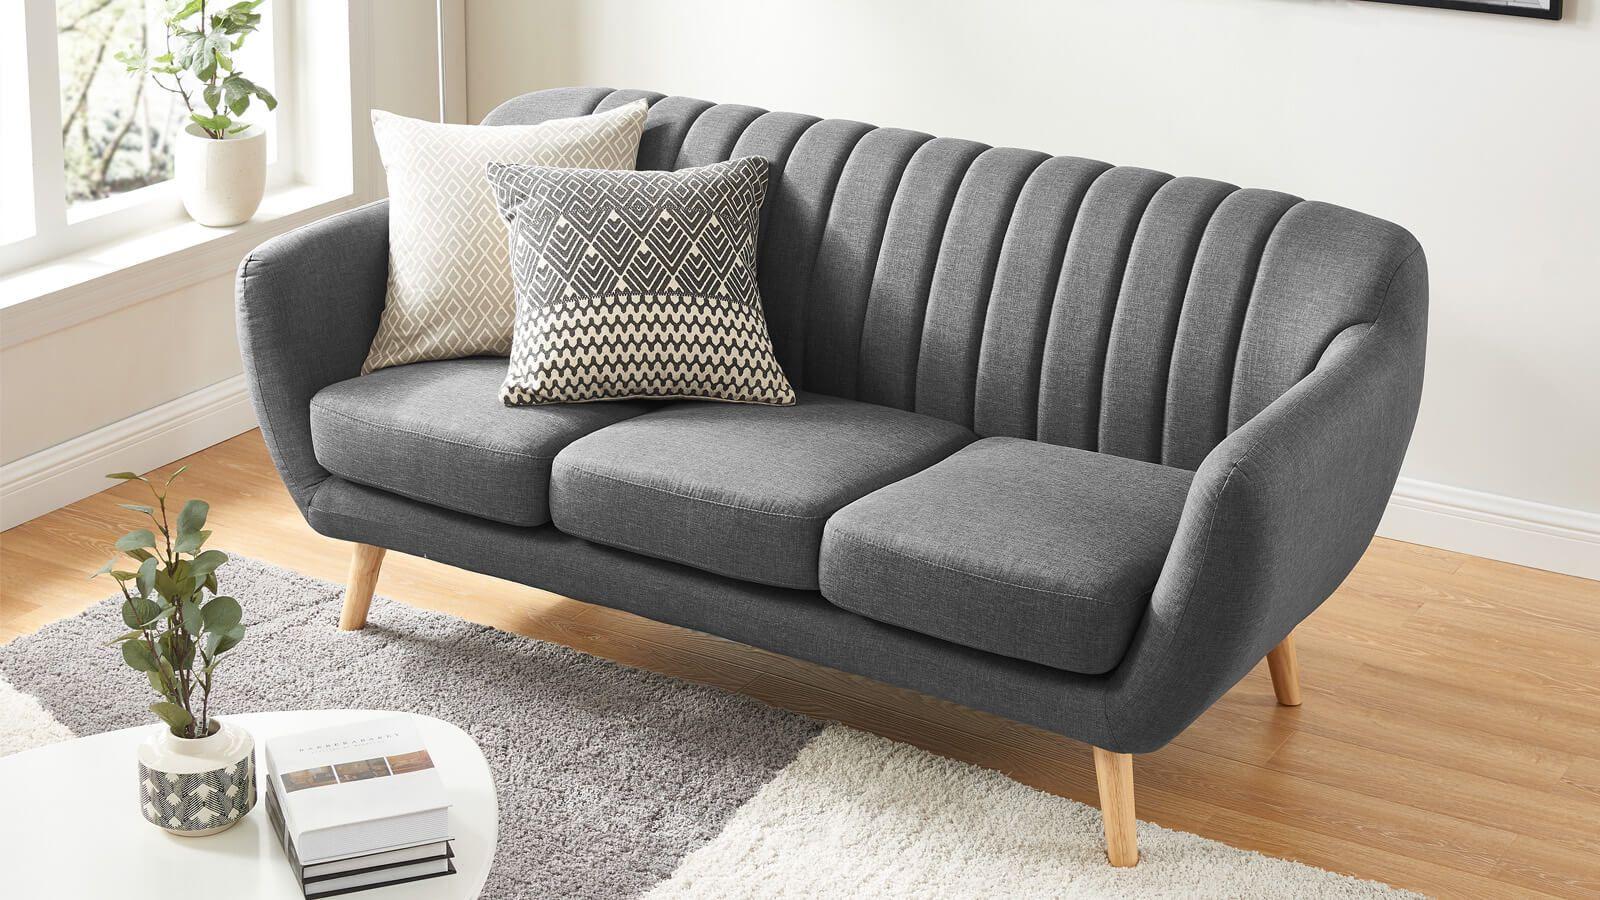 Canapé scandinave 3 places en tissu gris Collection Odda